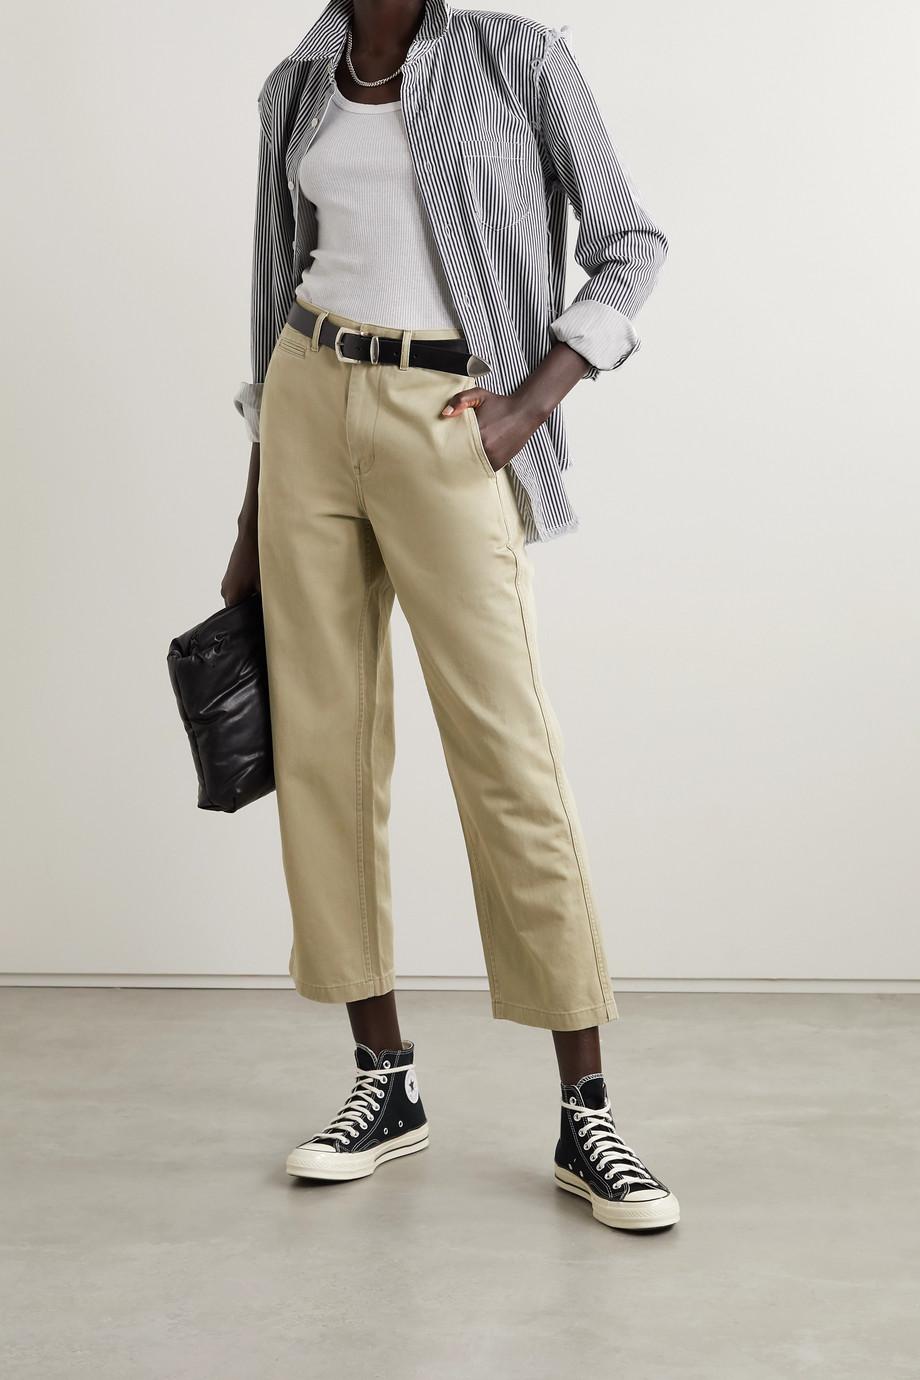 Denimist 仿旧条纹纯棉斜纹布衬衫